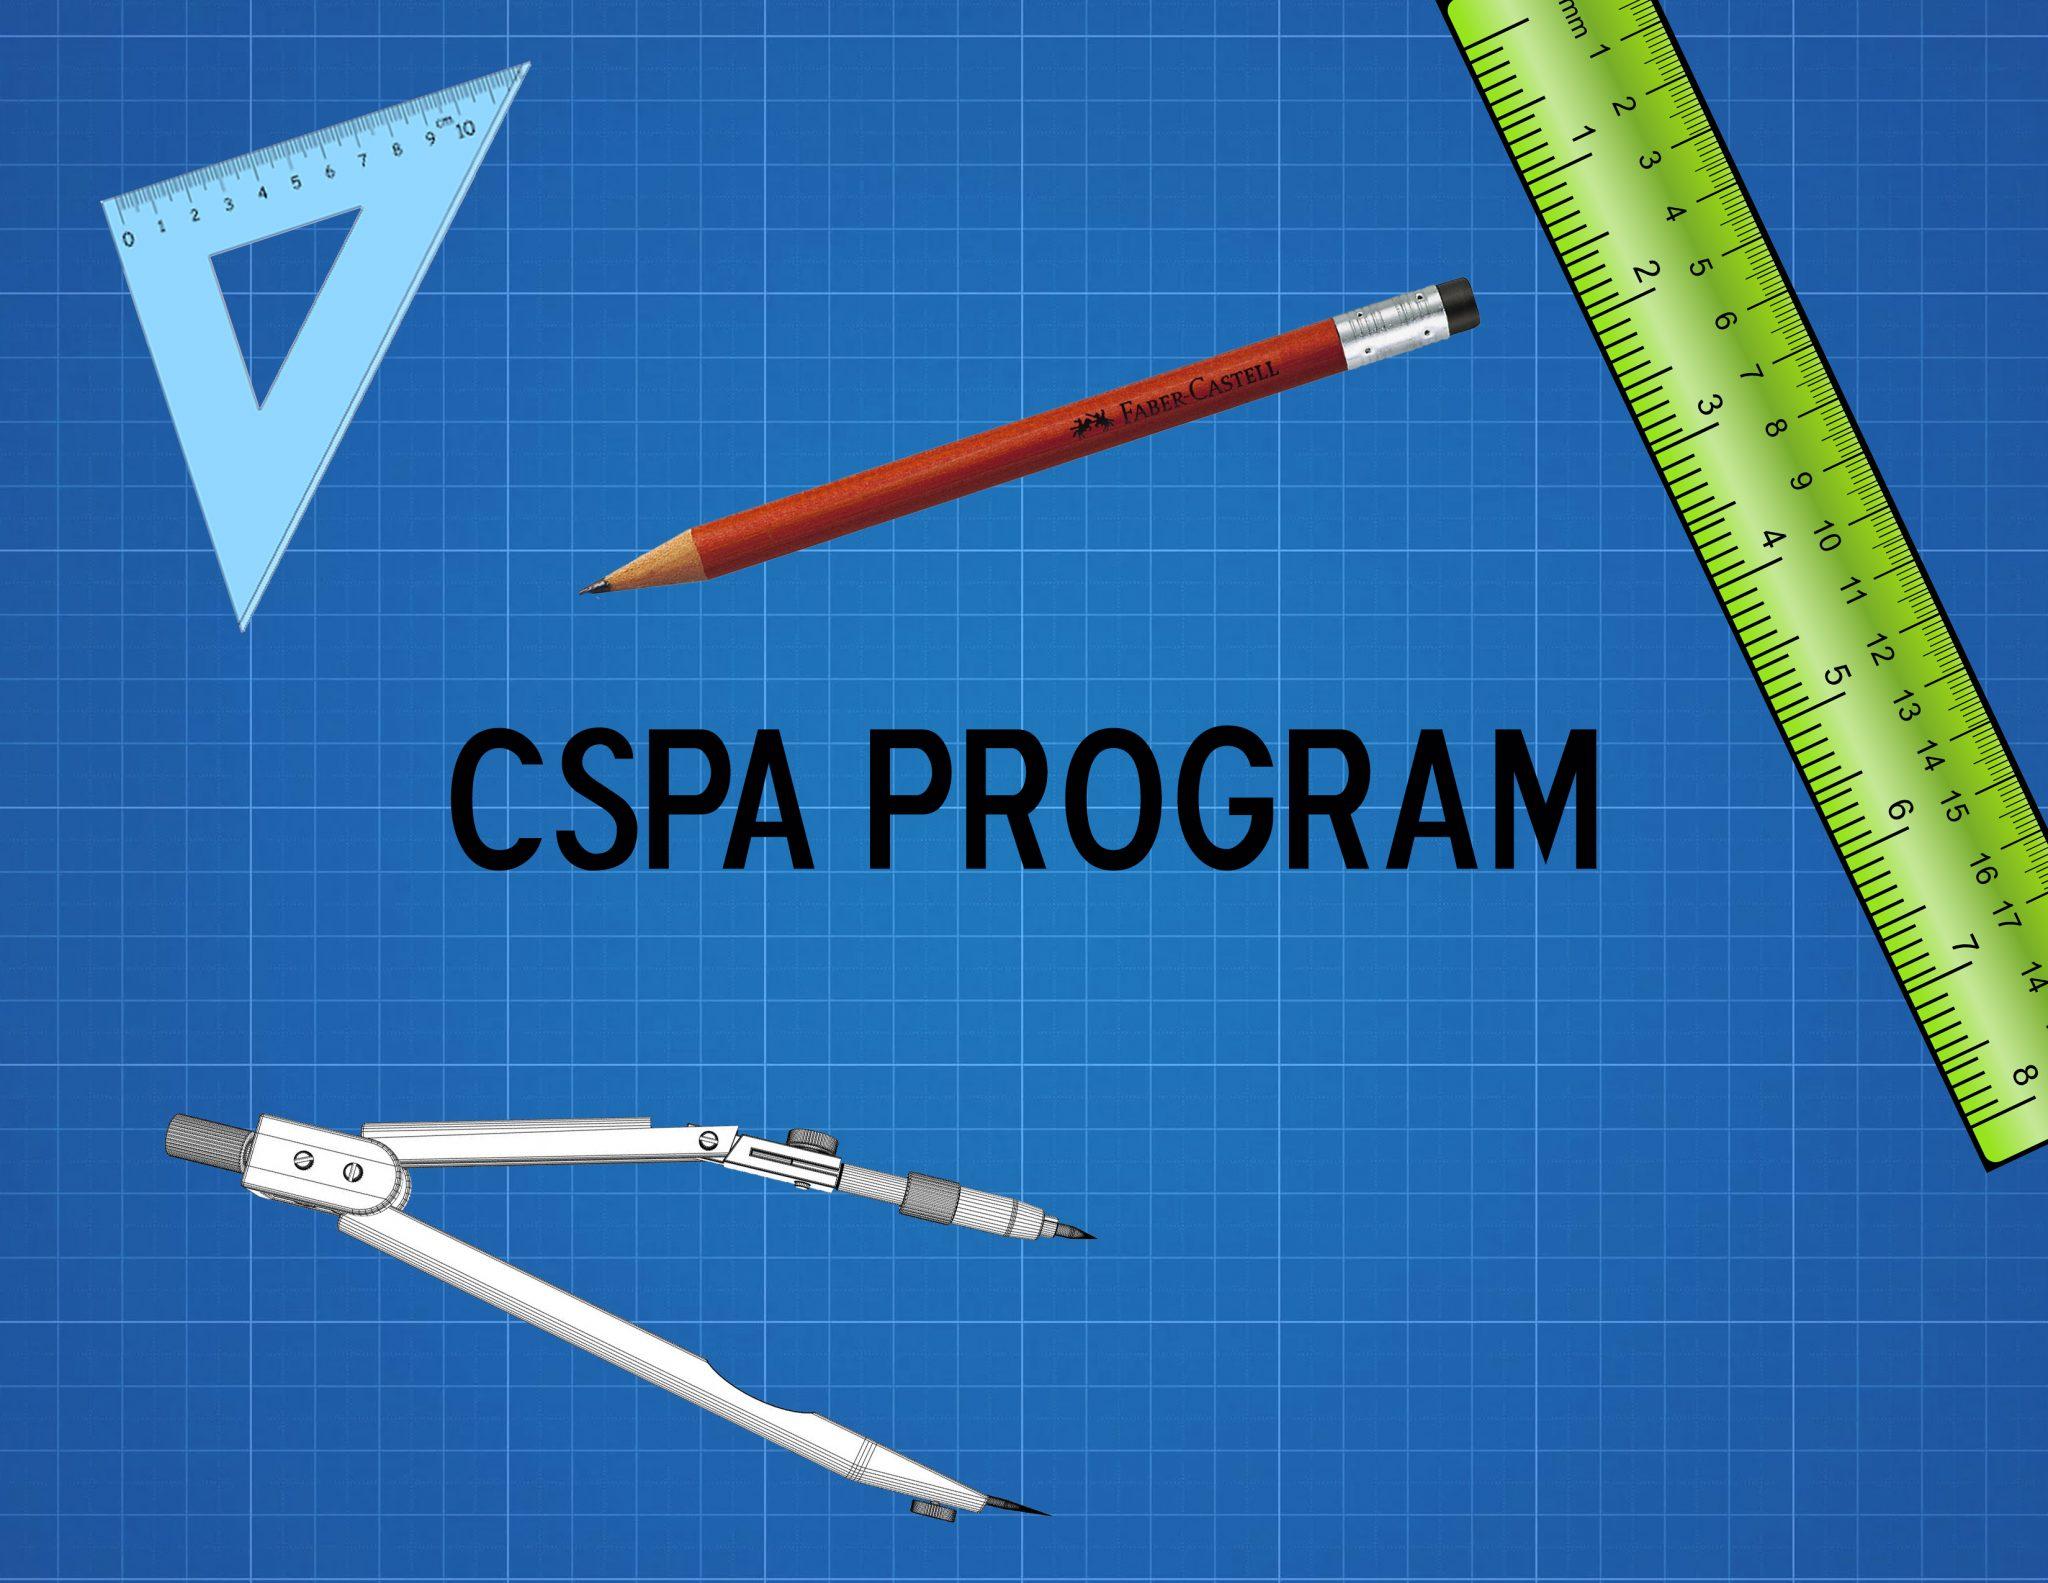 CSPA Program